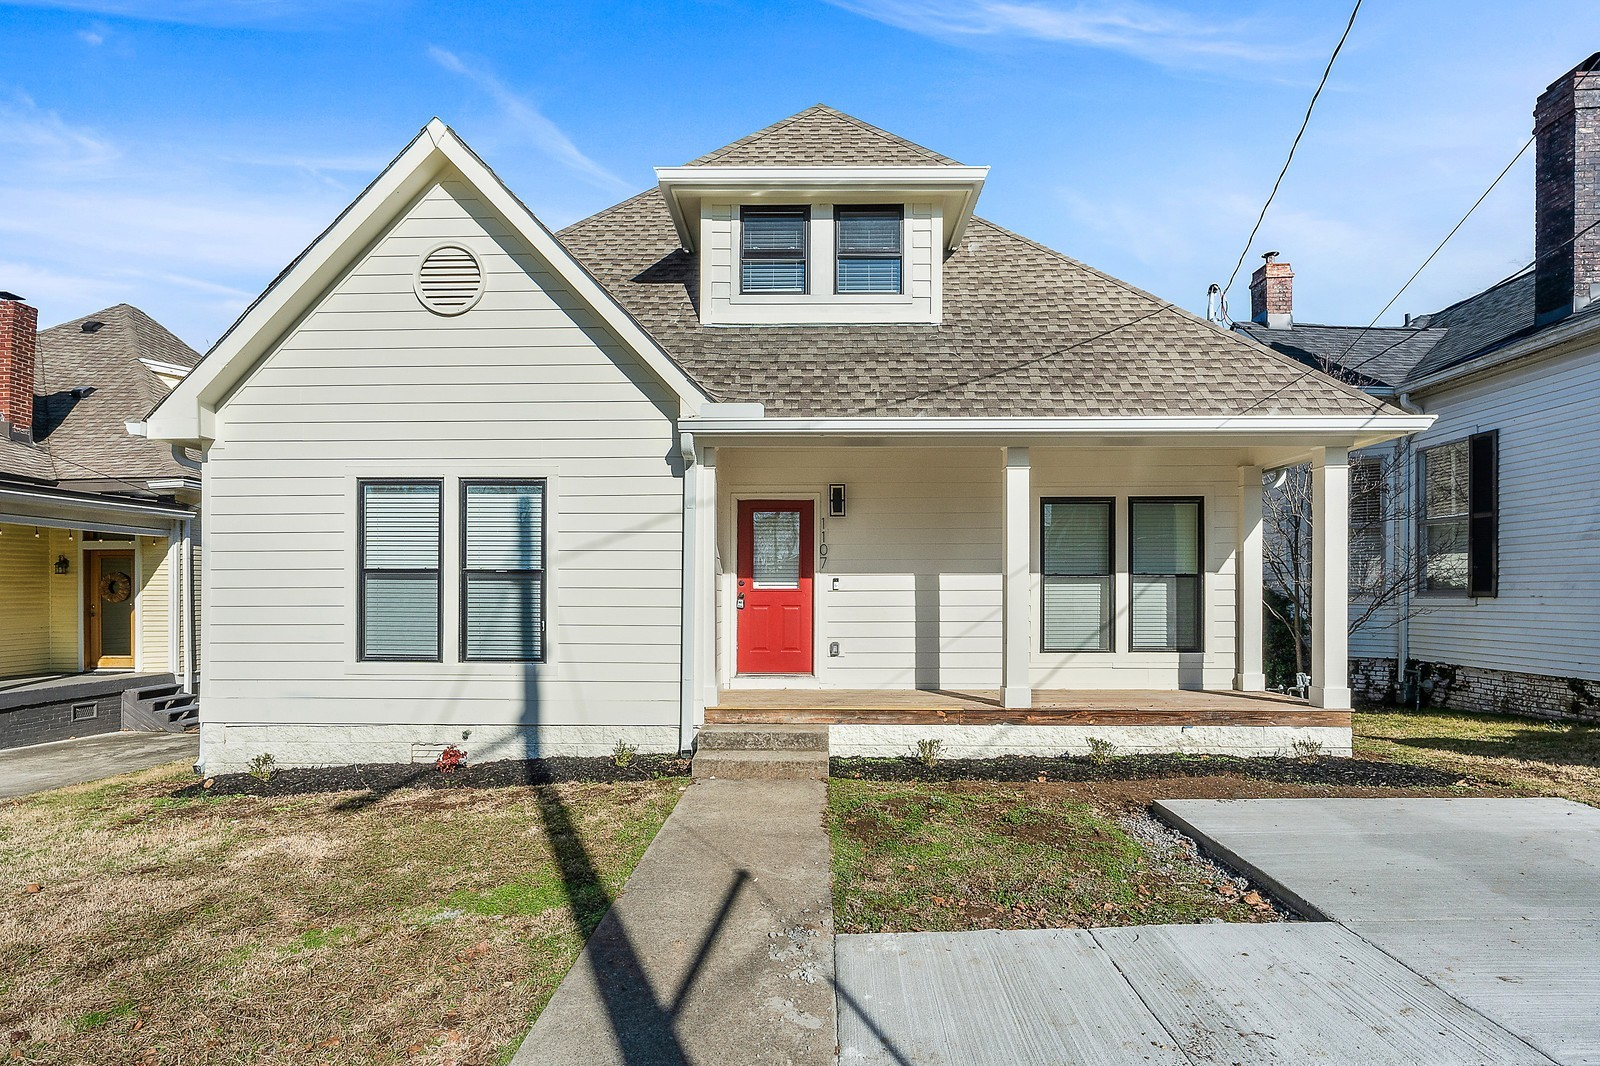 1107 Holly St, Nashville, TN 37206 - Nashville, TN real estate listing